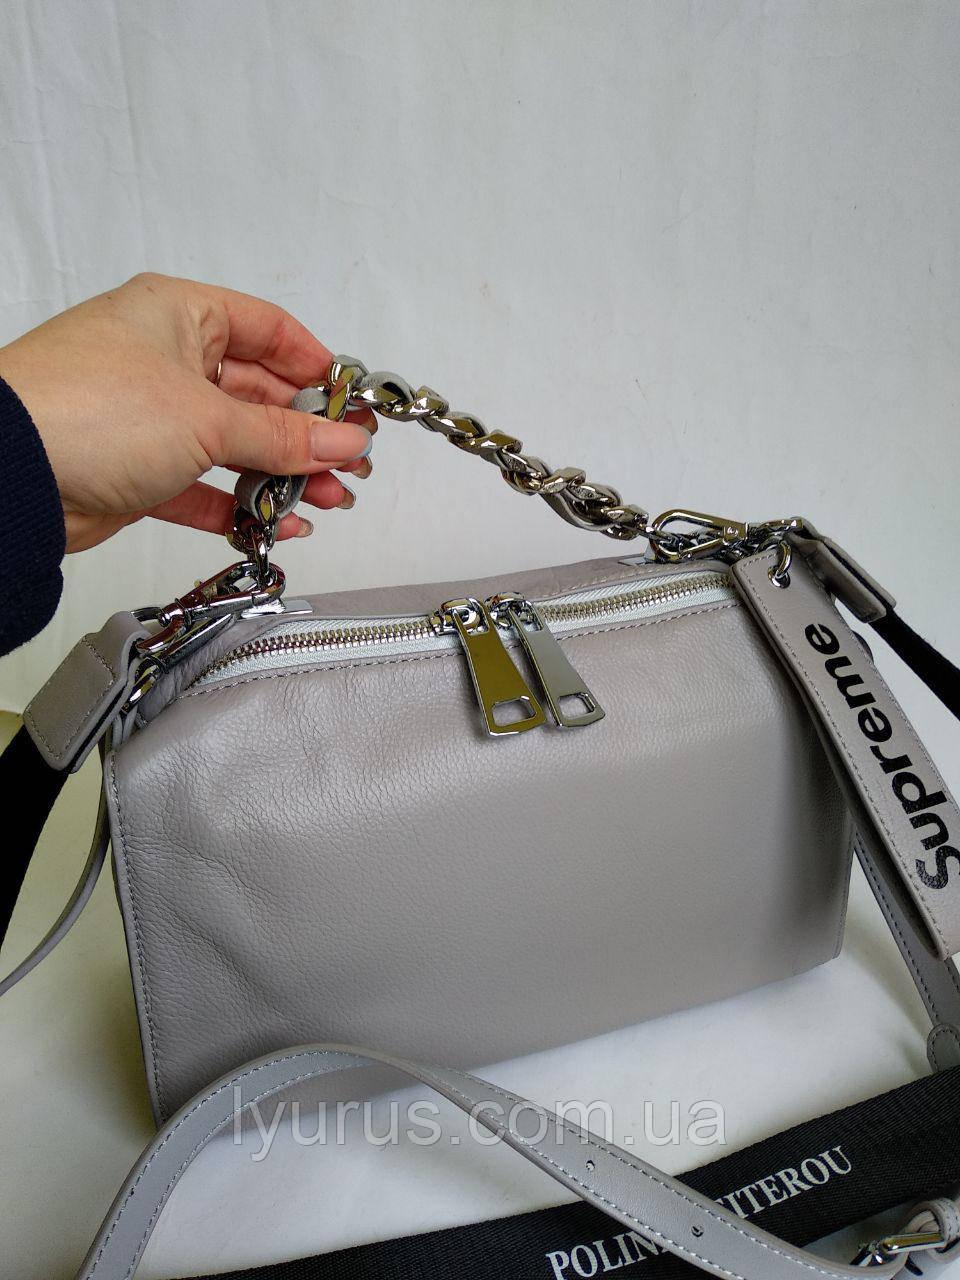 Жіноча шкіряна сумка Polina & Eiterou сіра